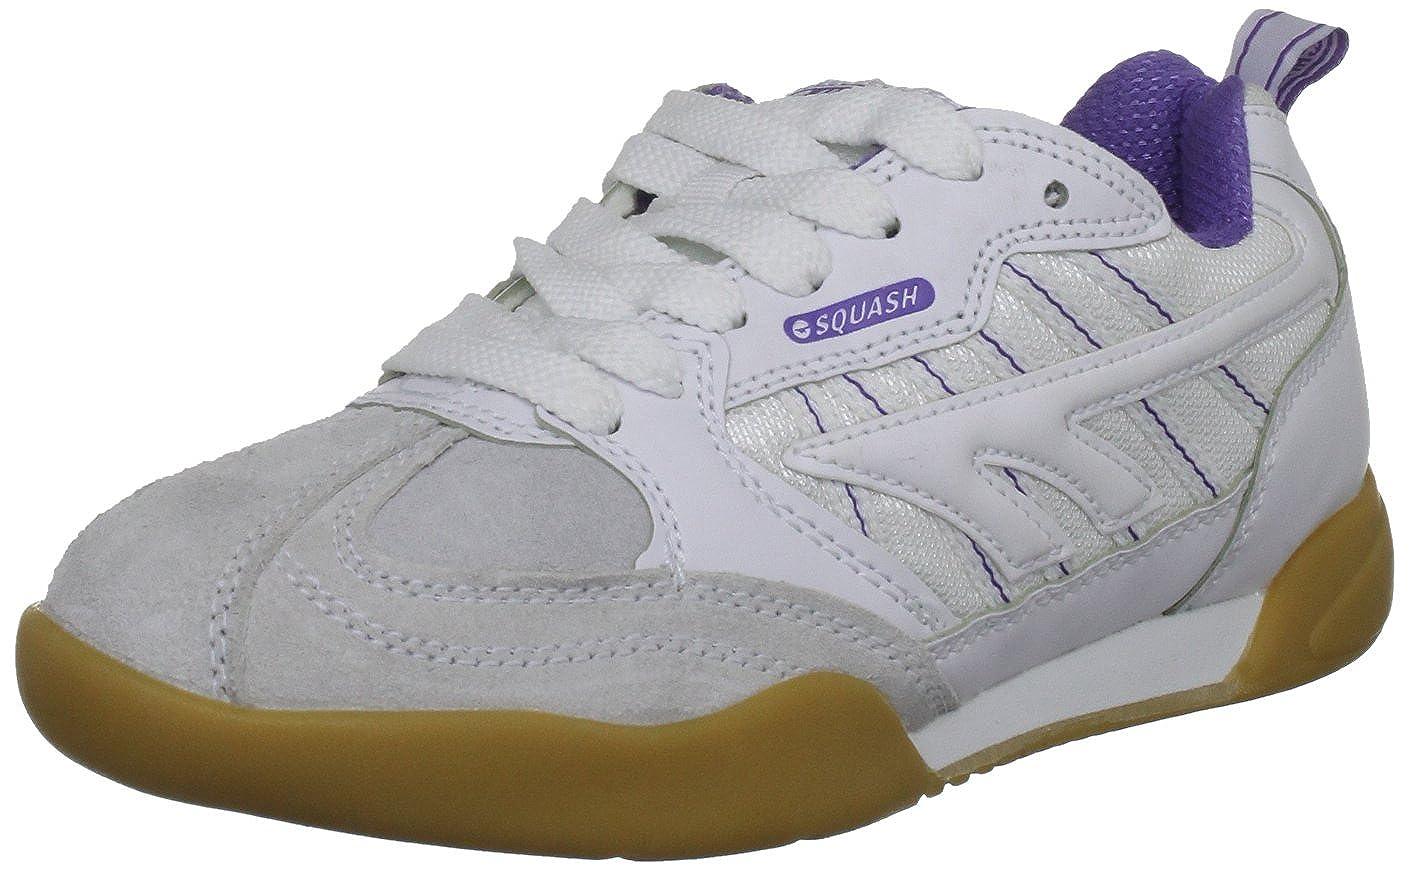 Hi-Tec Squash Classic W, Chaussures de squash femme 38 (5.5 UK) C002139/011/01